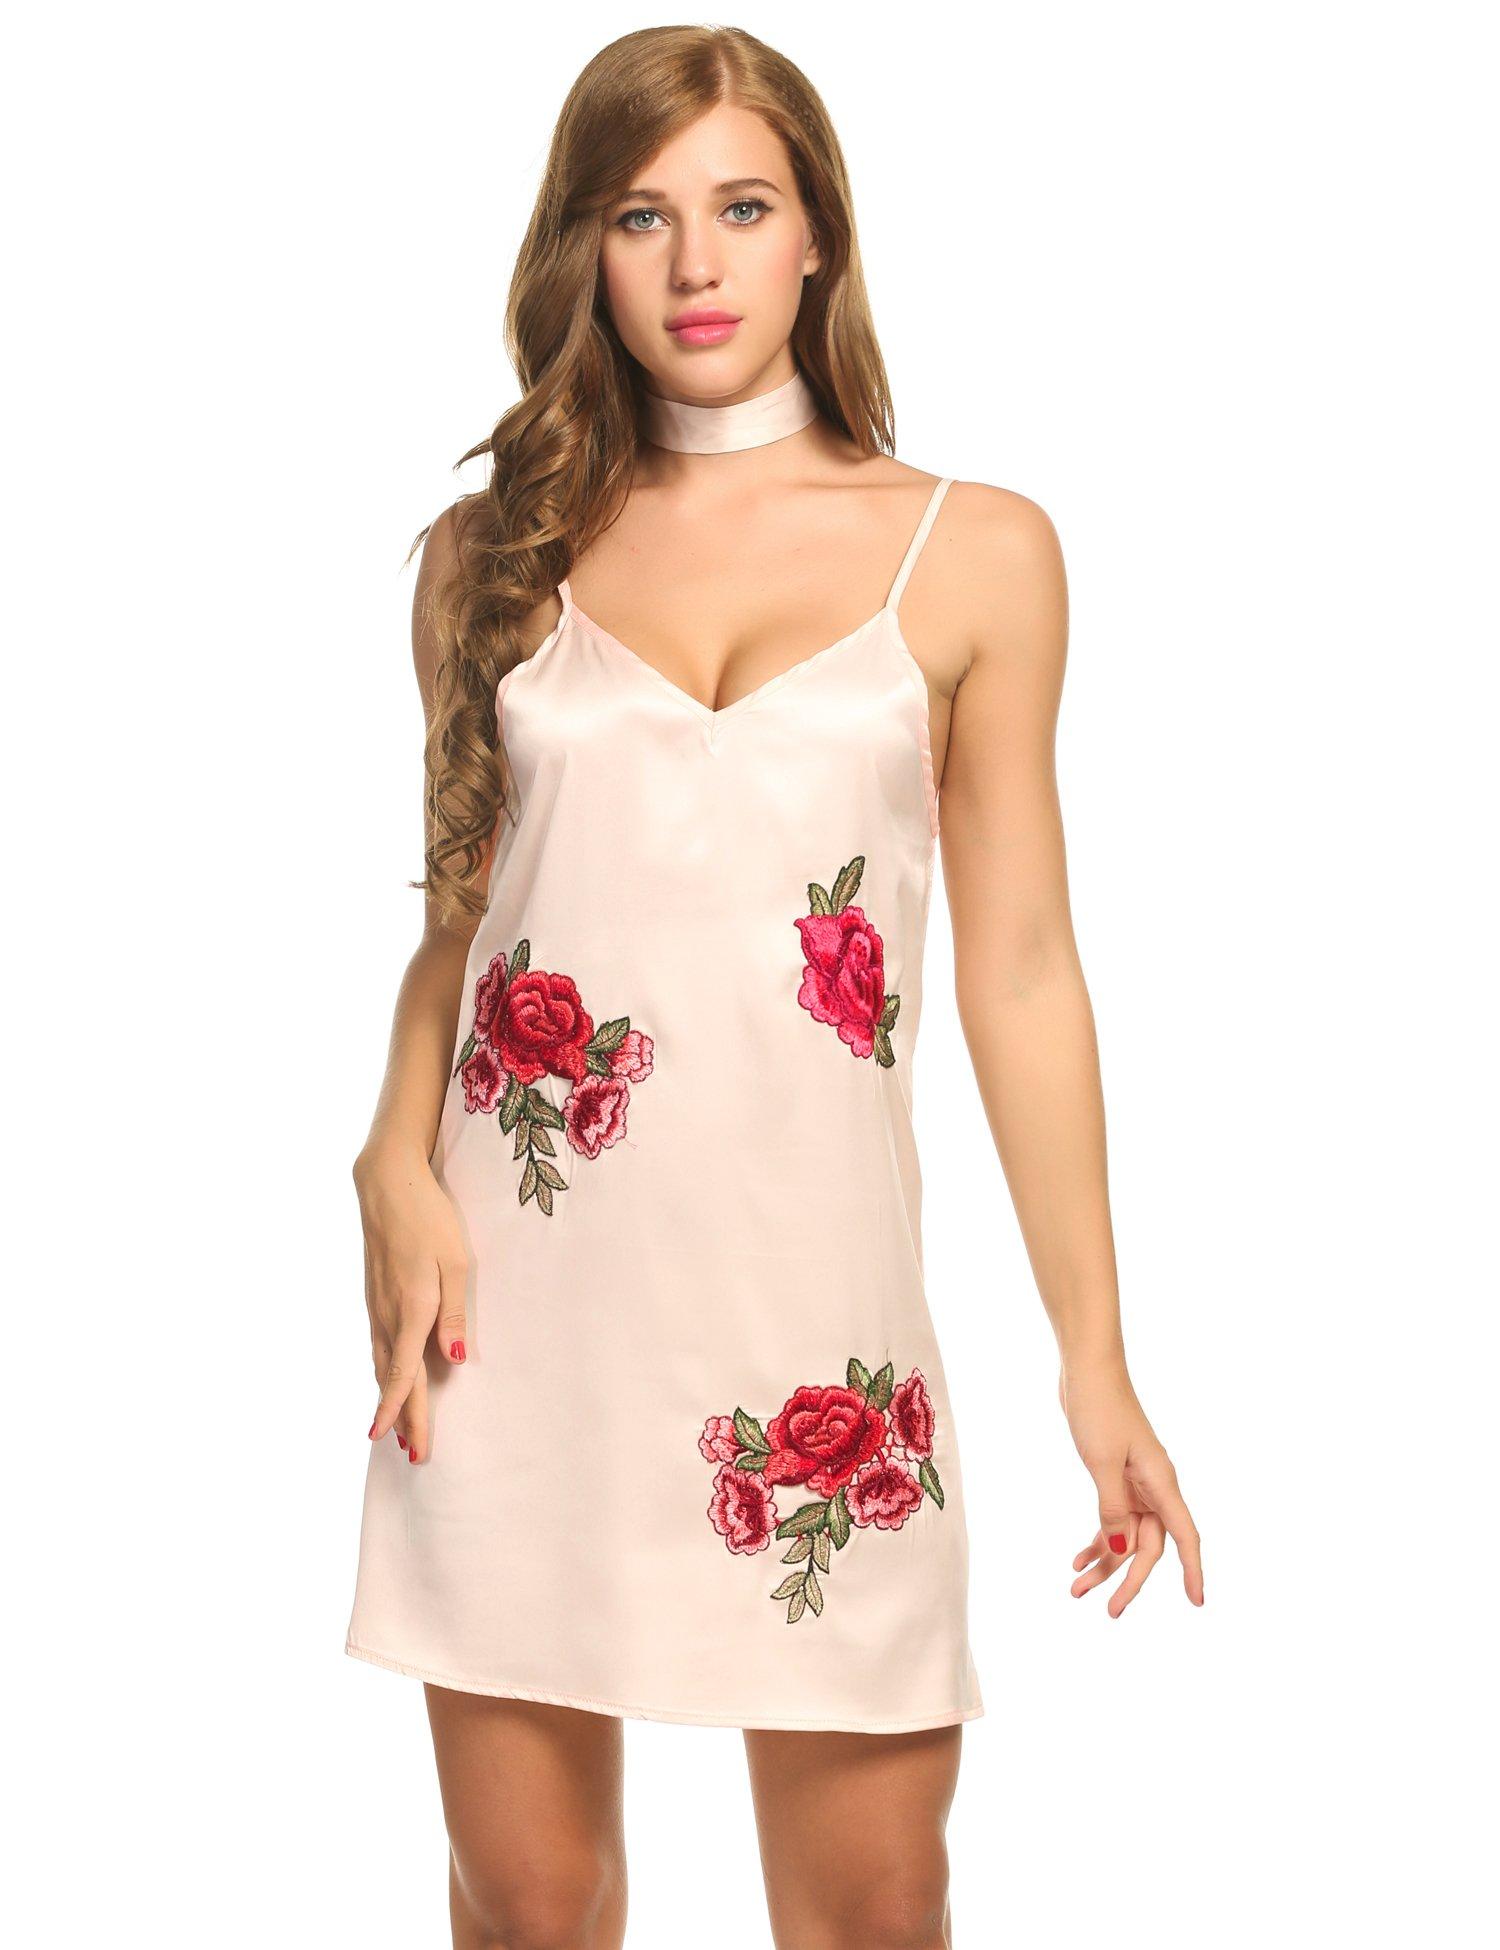 Women Sexy Sleepwear Satin Spaghetti Strap Chemises Slip Nightgown Beige, S